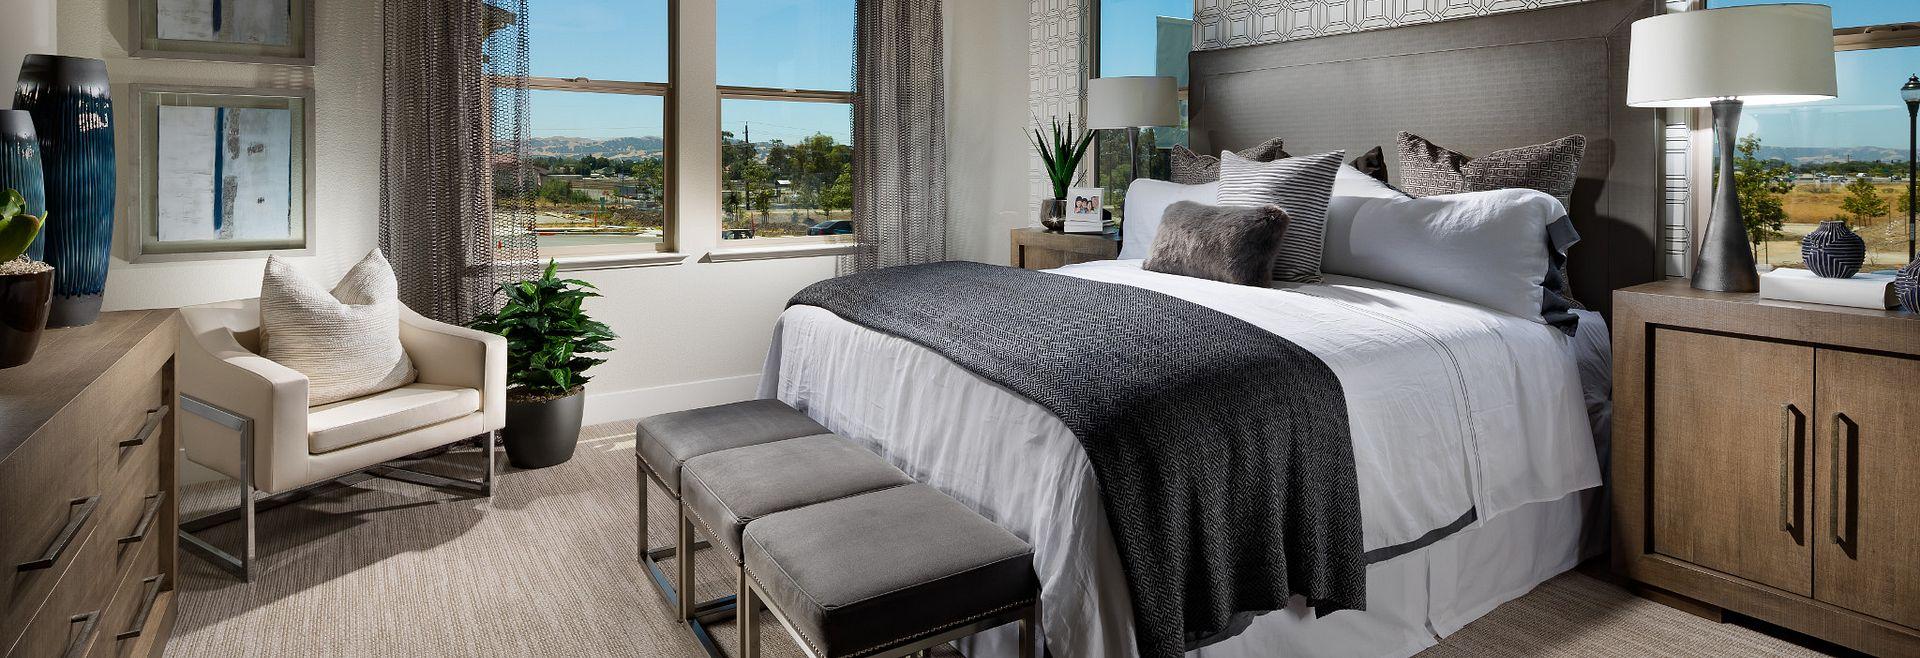 Harmony Sage Livermore Plan 3 Master Bedroom